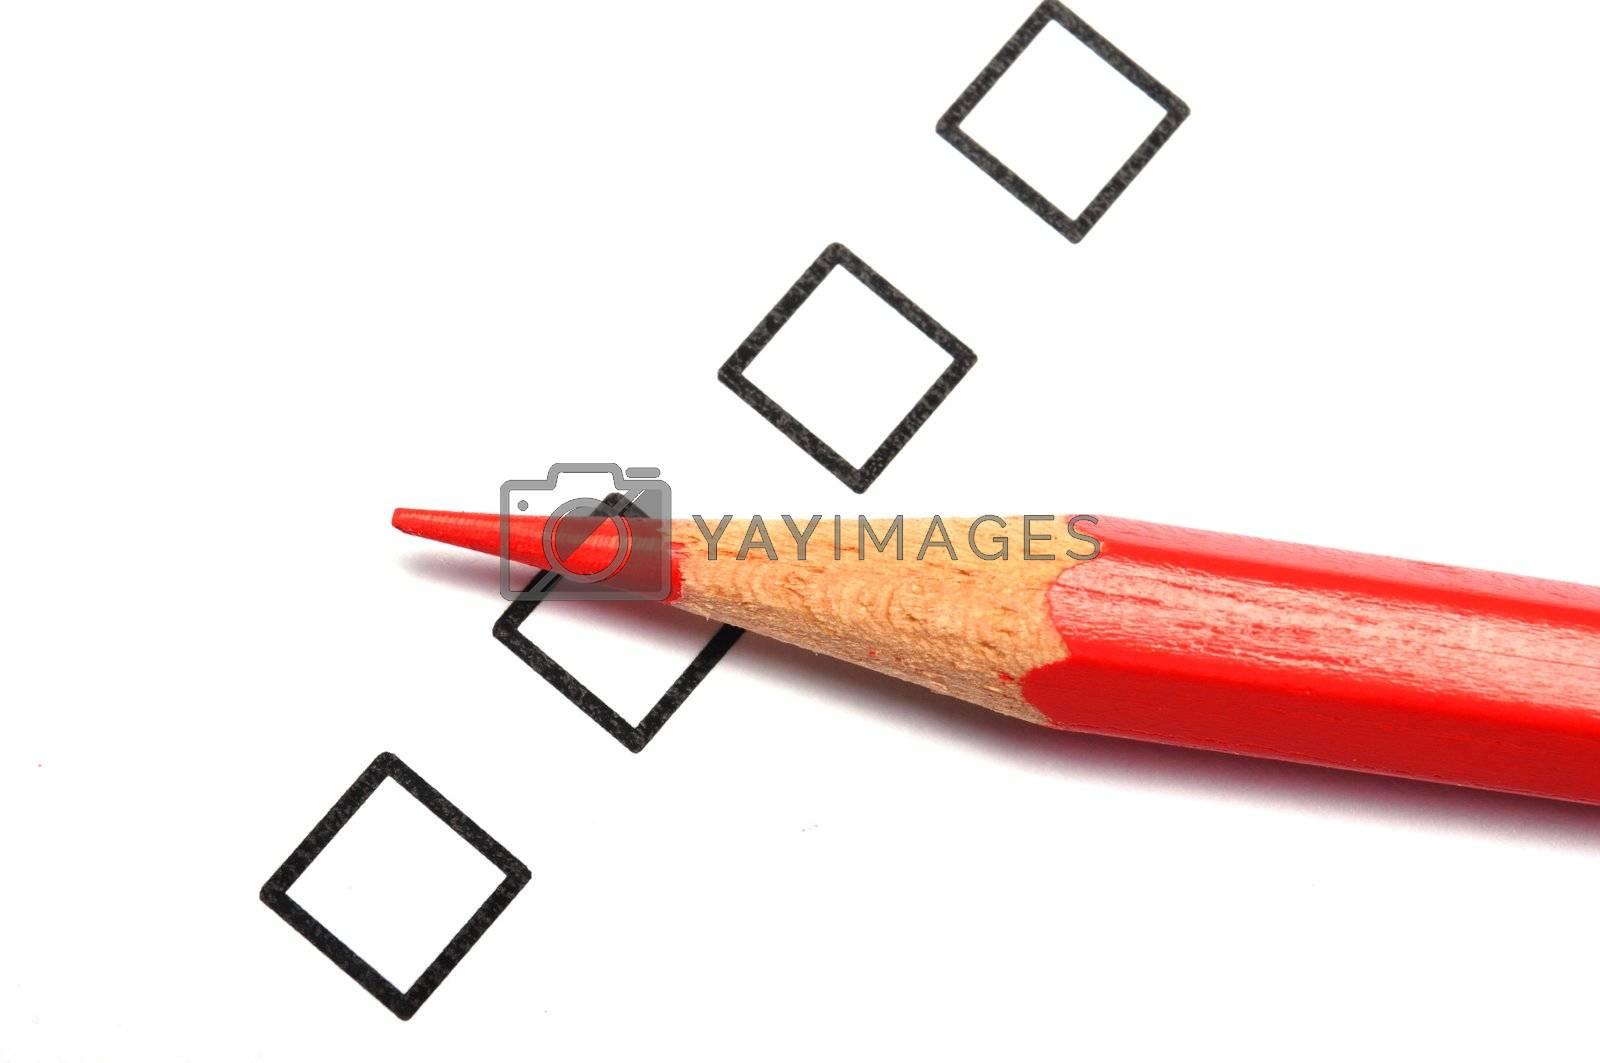 satisfaction survey by gunnar3000